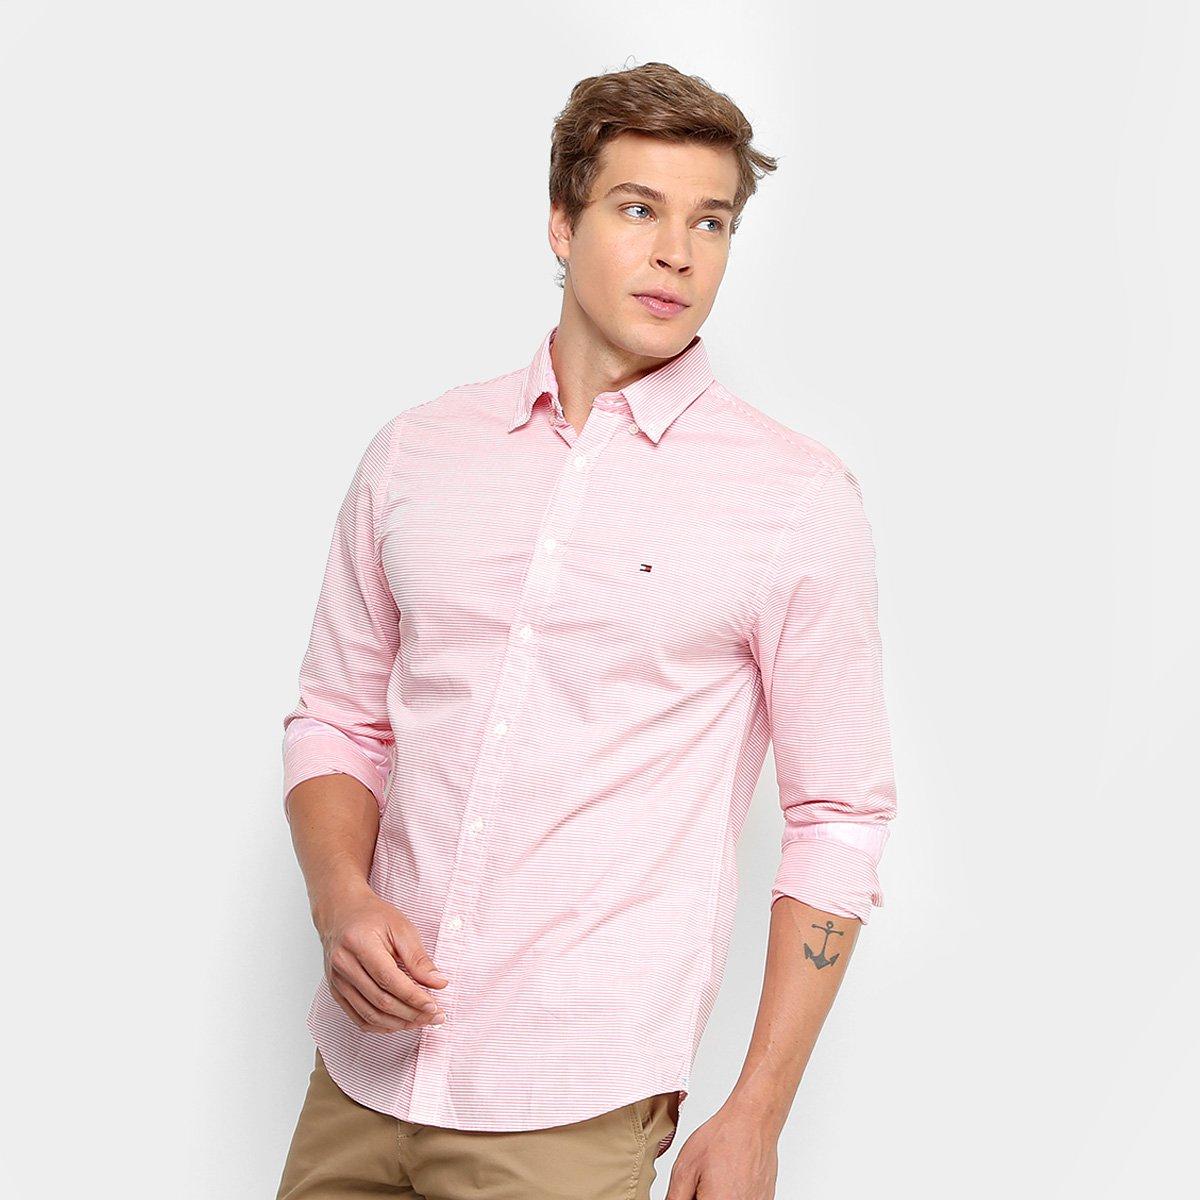 Camisa social tommy hilfiger manga longa lisa masculina compre jpg  1200x1200 Blusa estilo social 5262e77604425